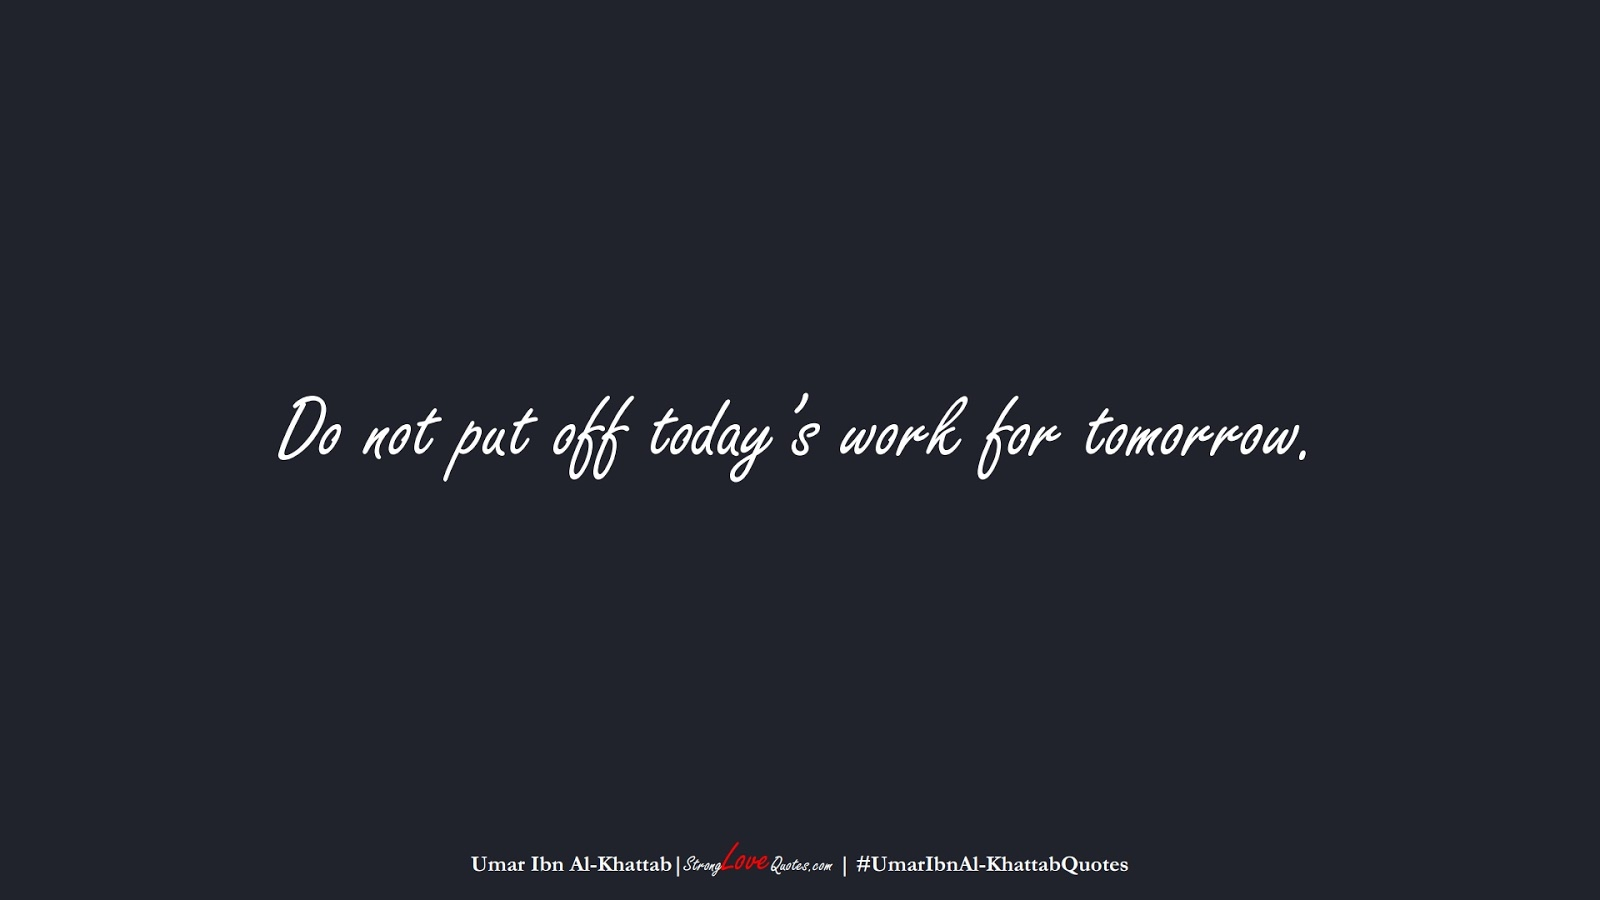 Do not put off today's work for tomorrow. (Umar Ibn Al-Khattab);  #UmarIbnAl-KhattabQuotes